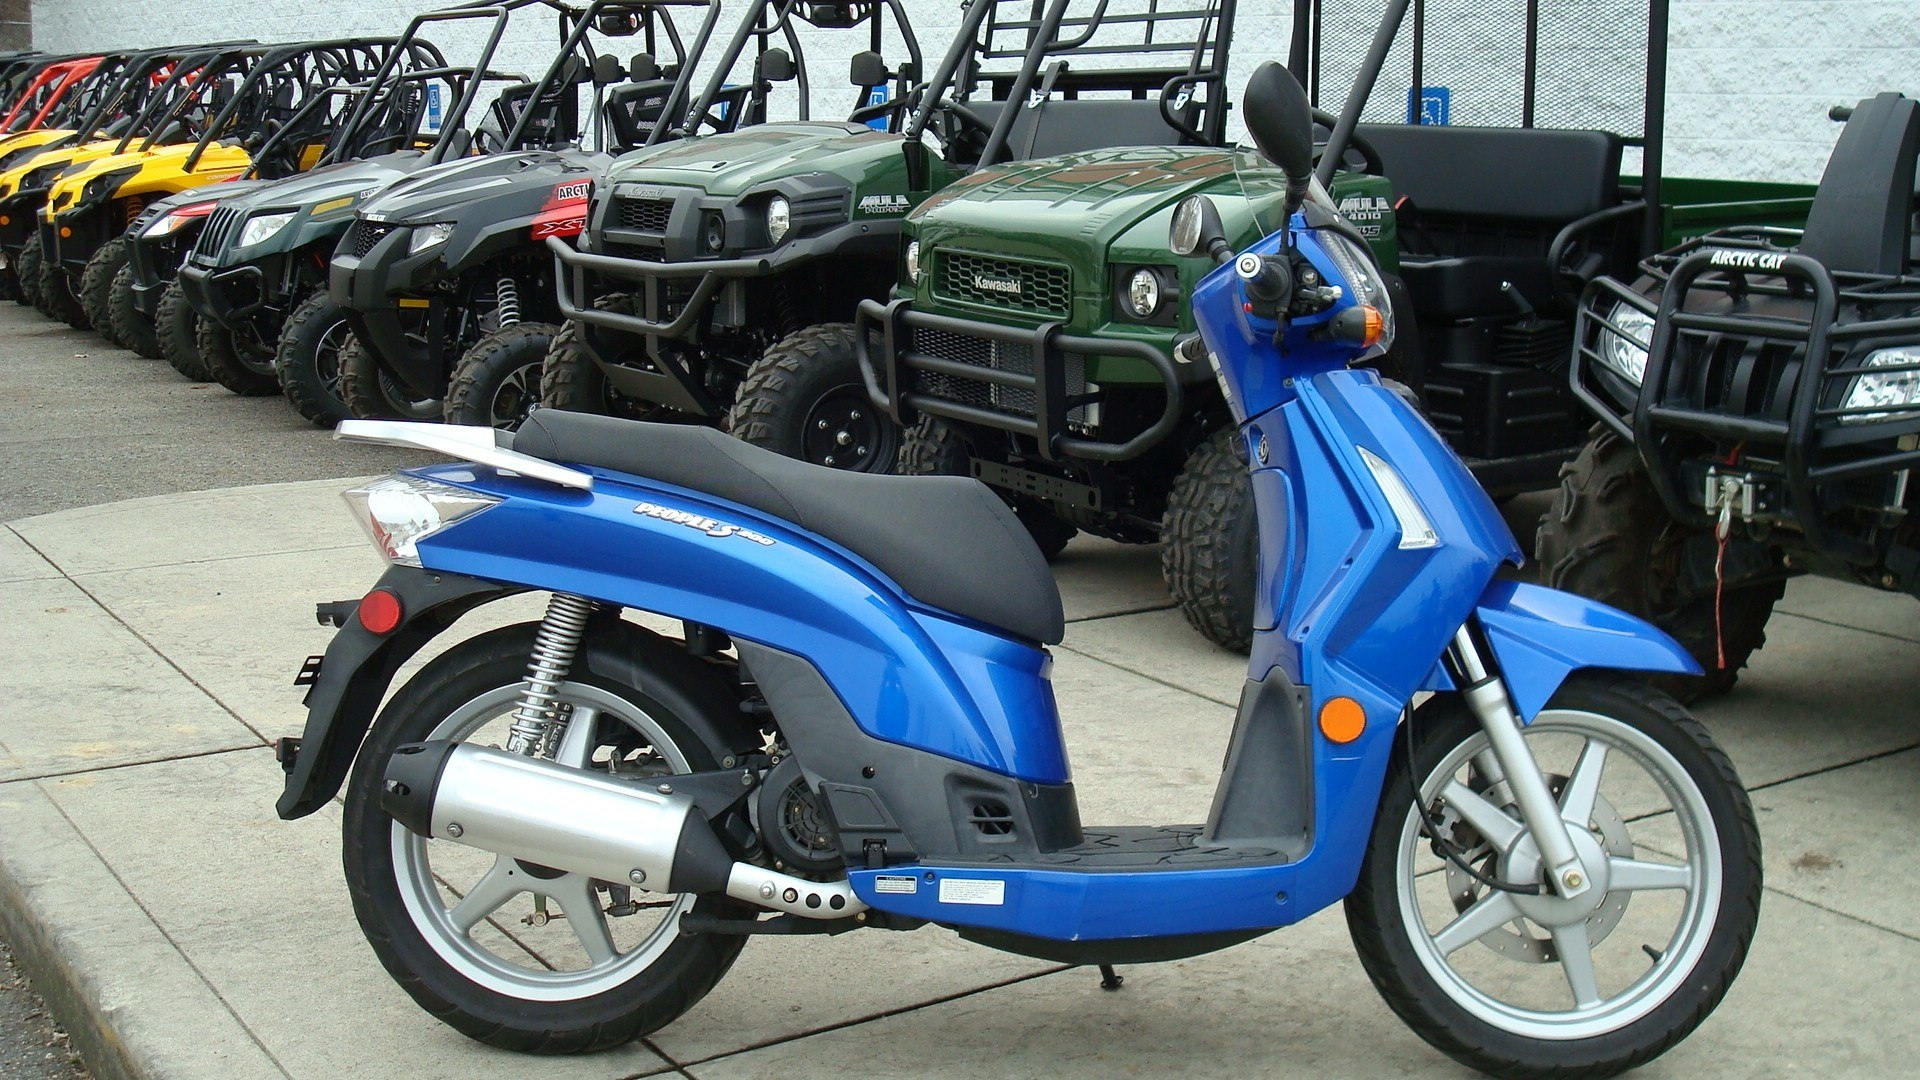 2009 250 XCITING